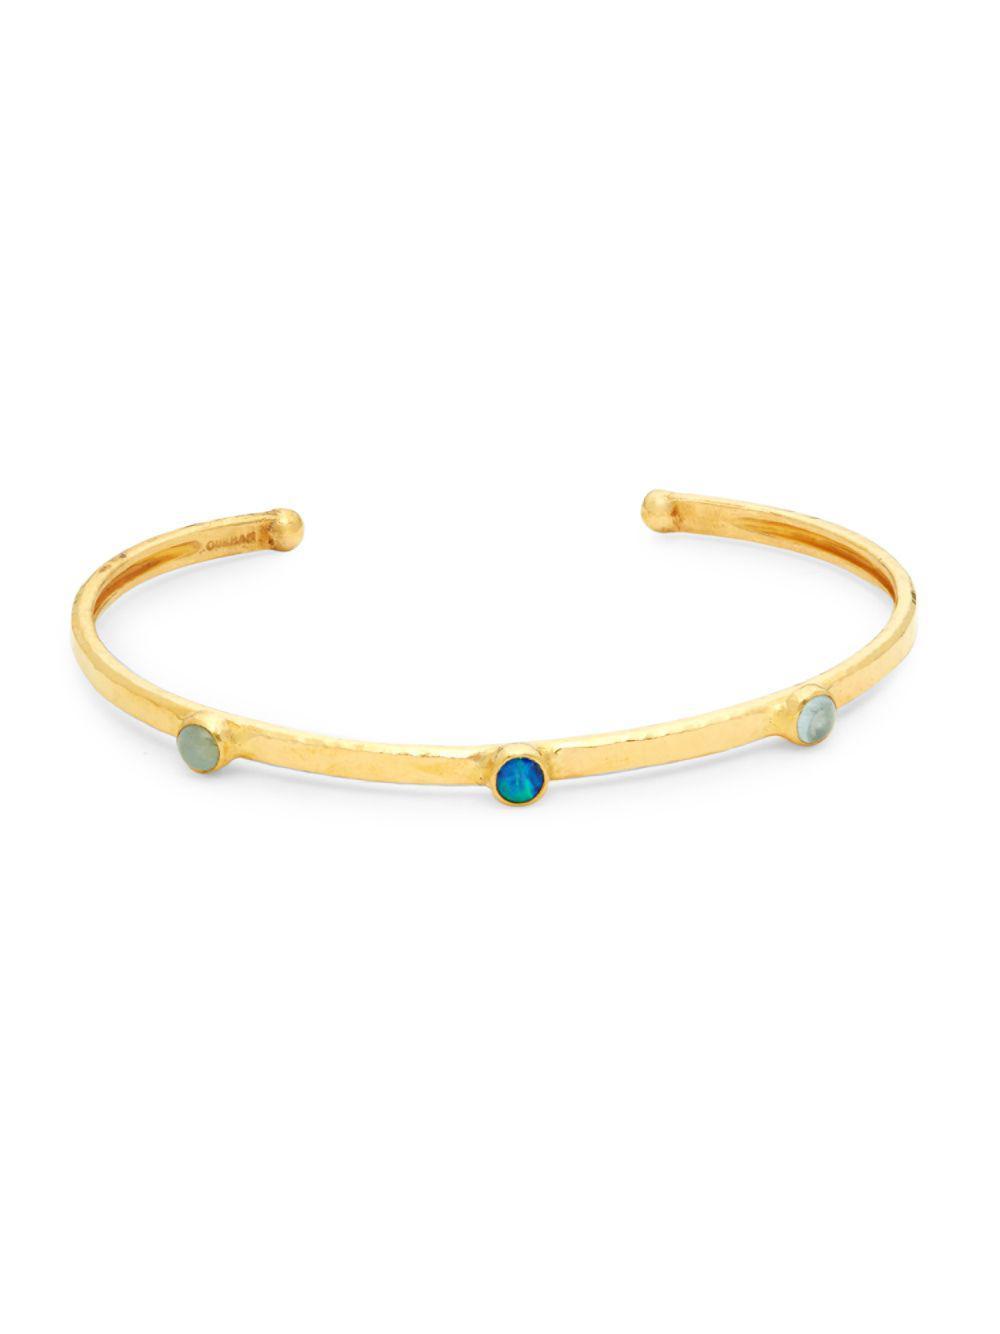 Gurhan Amulet 24k Vermeil Cuff Bracelet FuKLkT2Ch